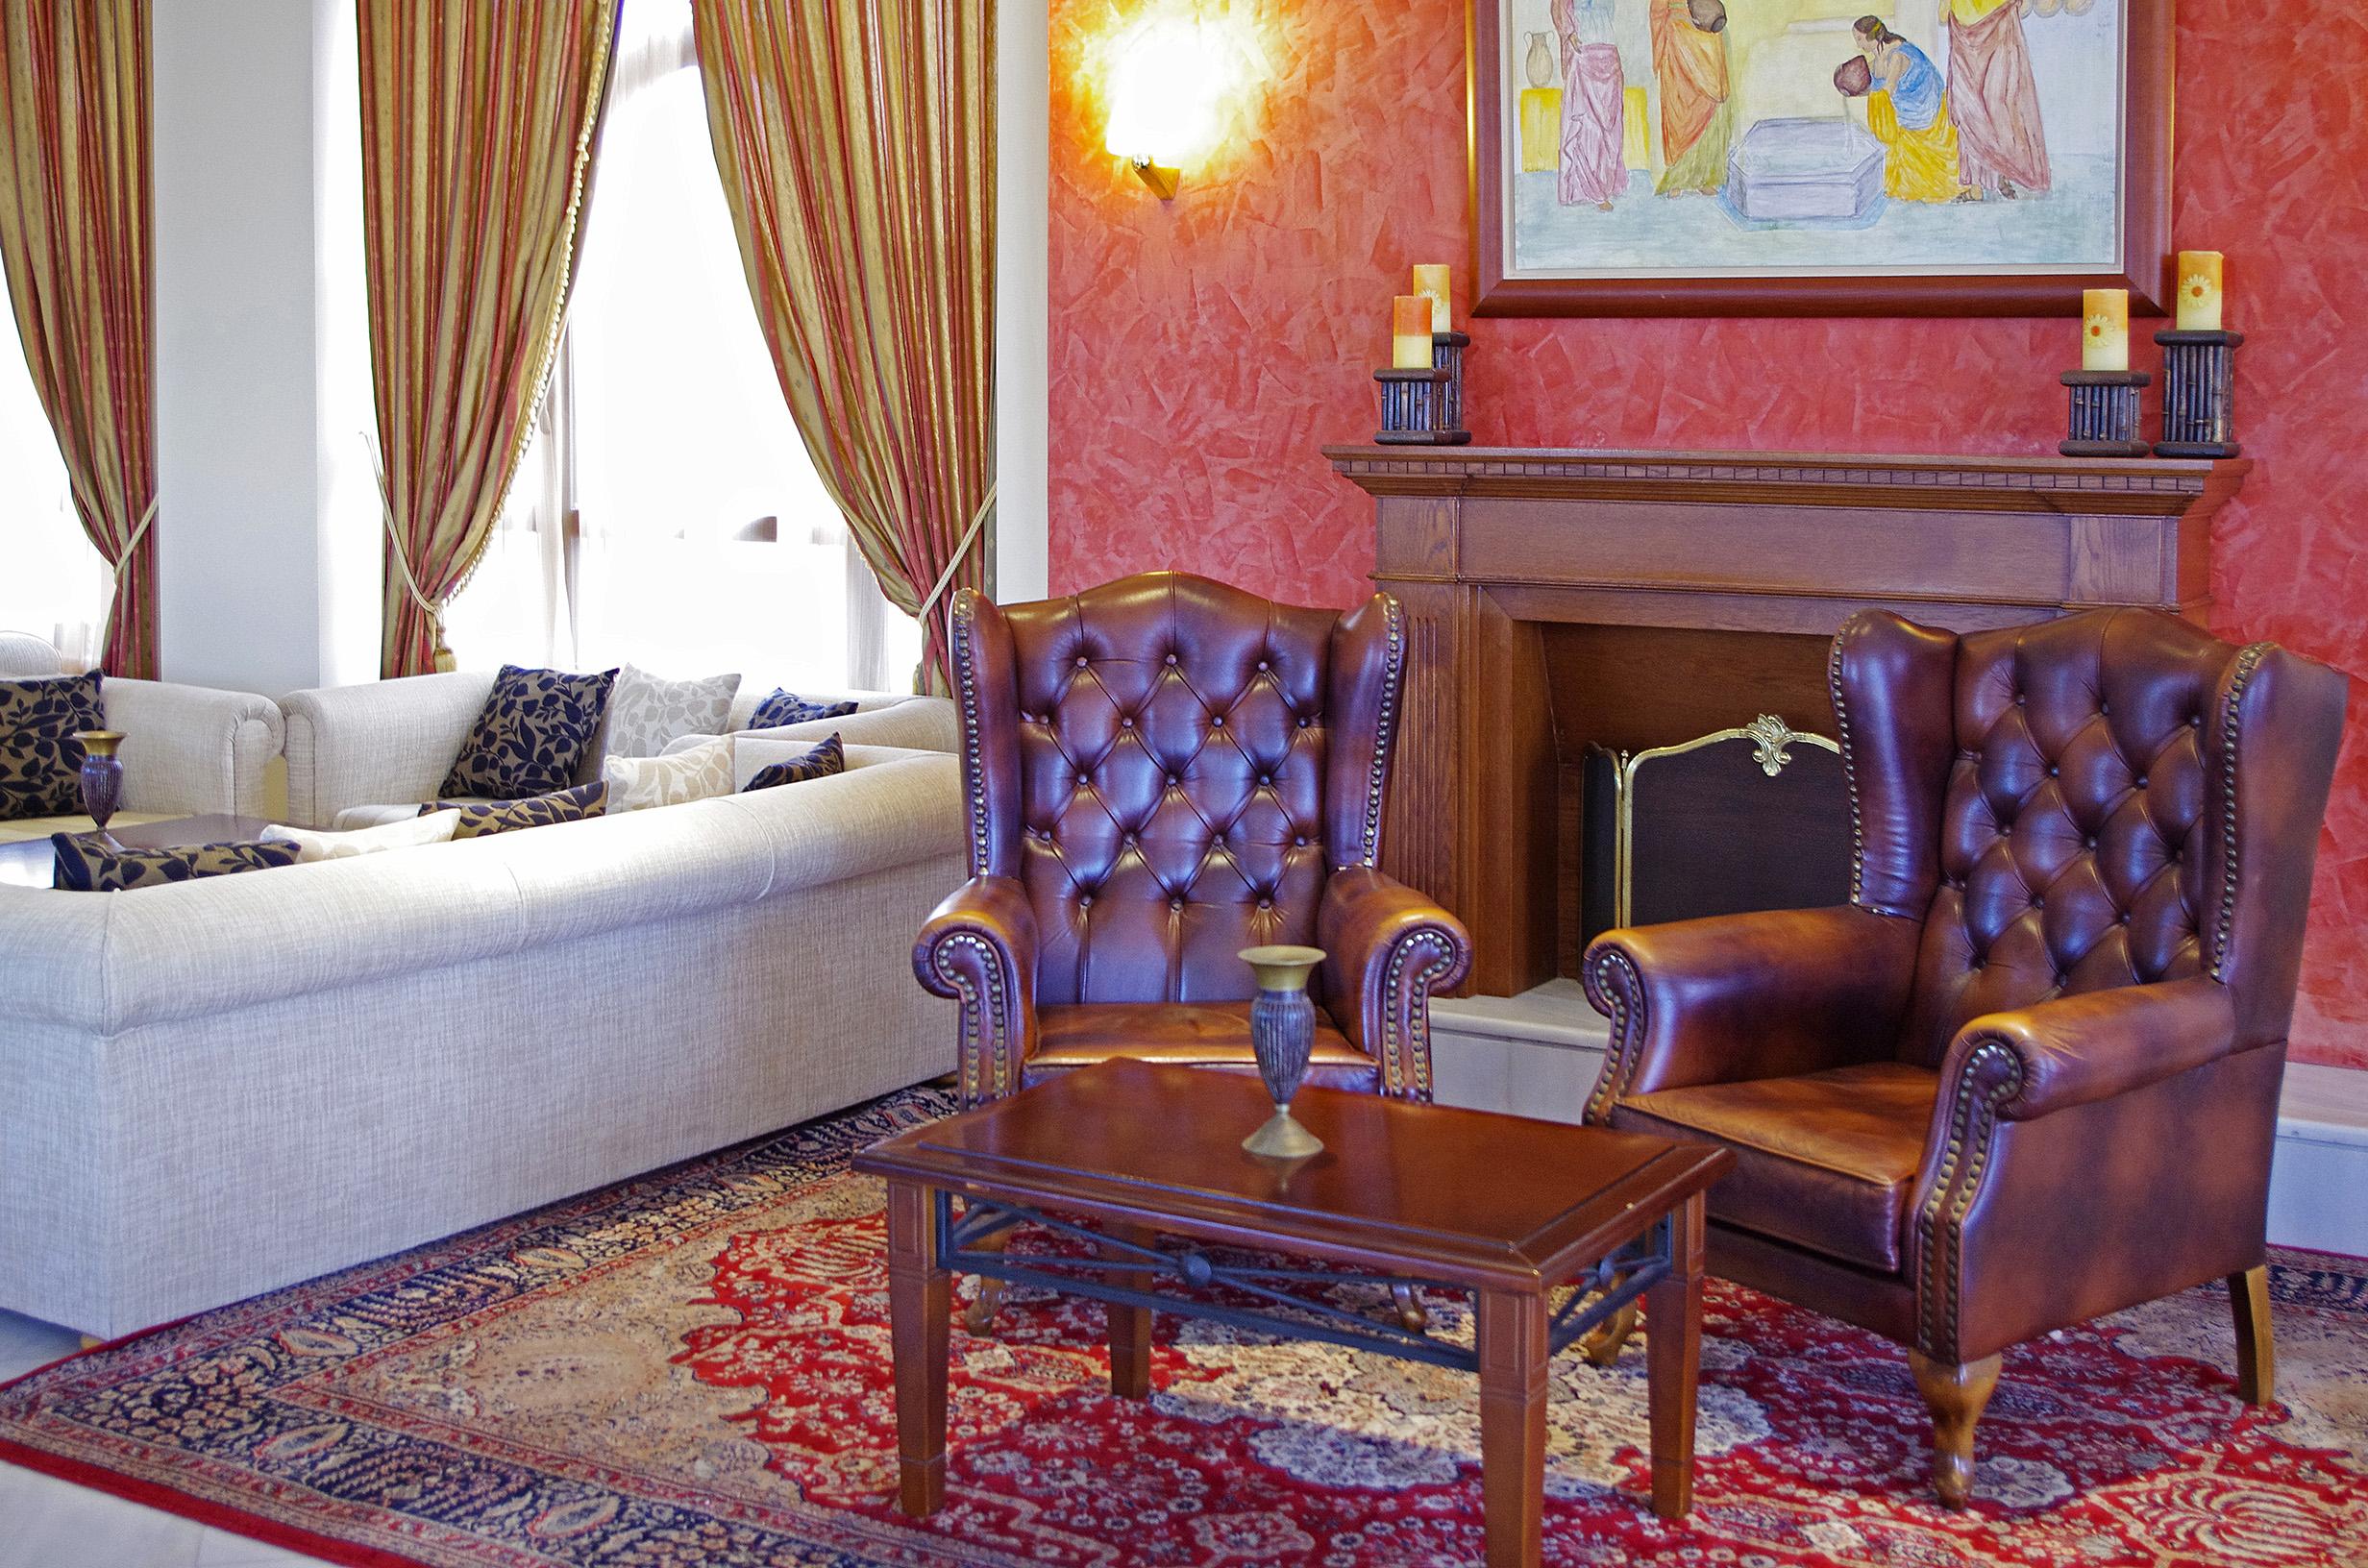 Dionysos Lounge at Mythos Palace Resort & Spa in Georgioupolis